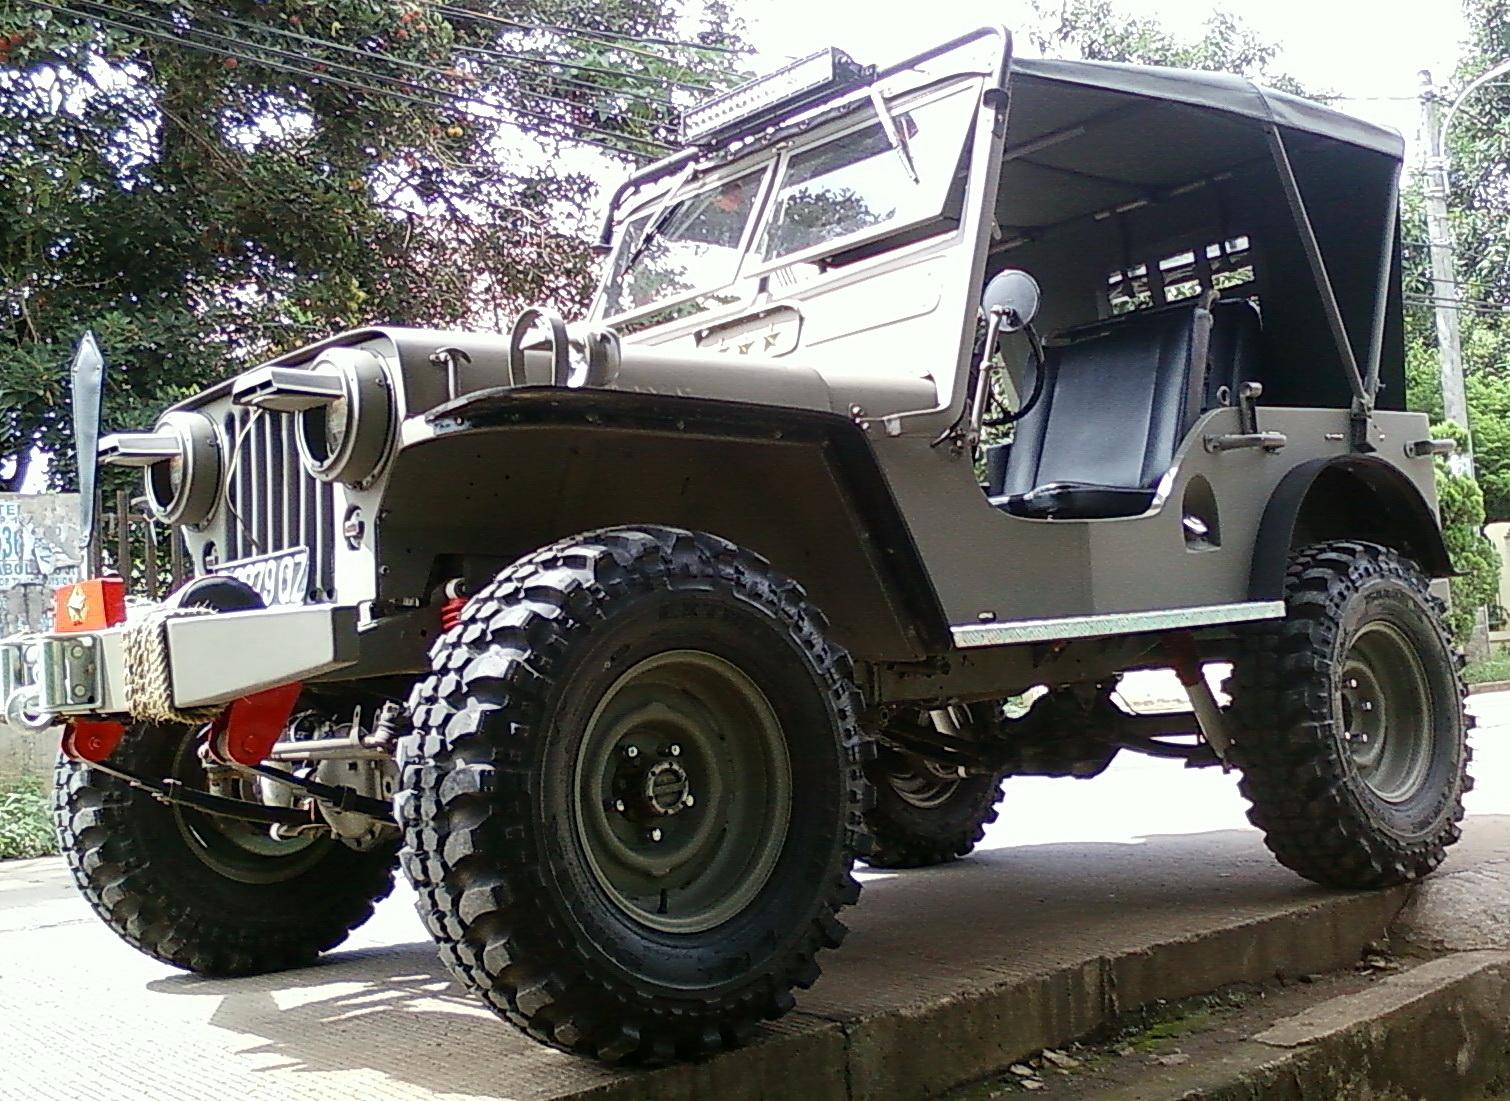 Foto Mobil Jeep Tua Modifikasi Mobil